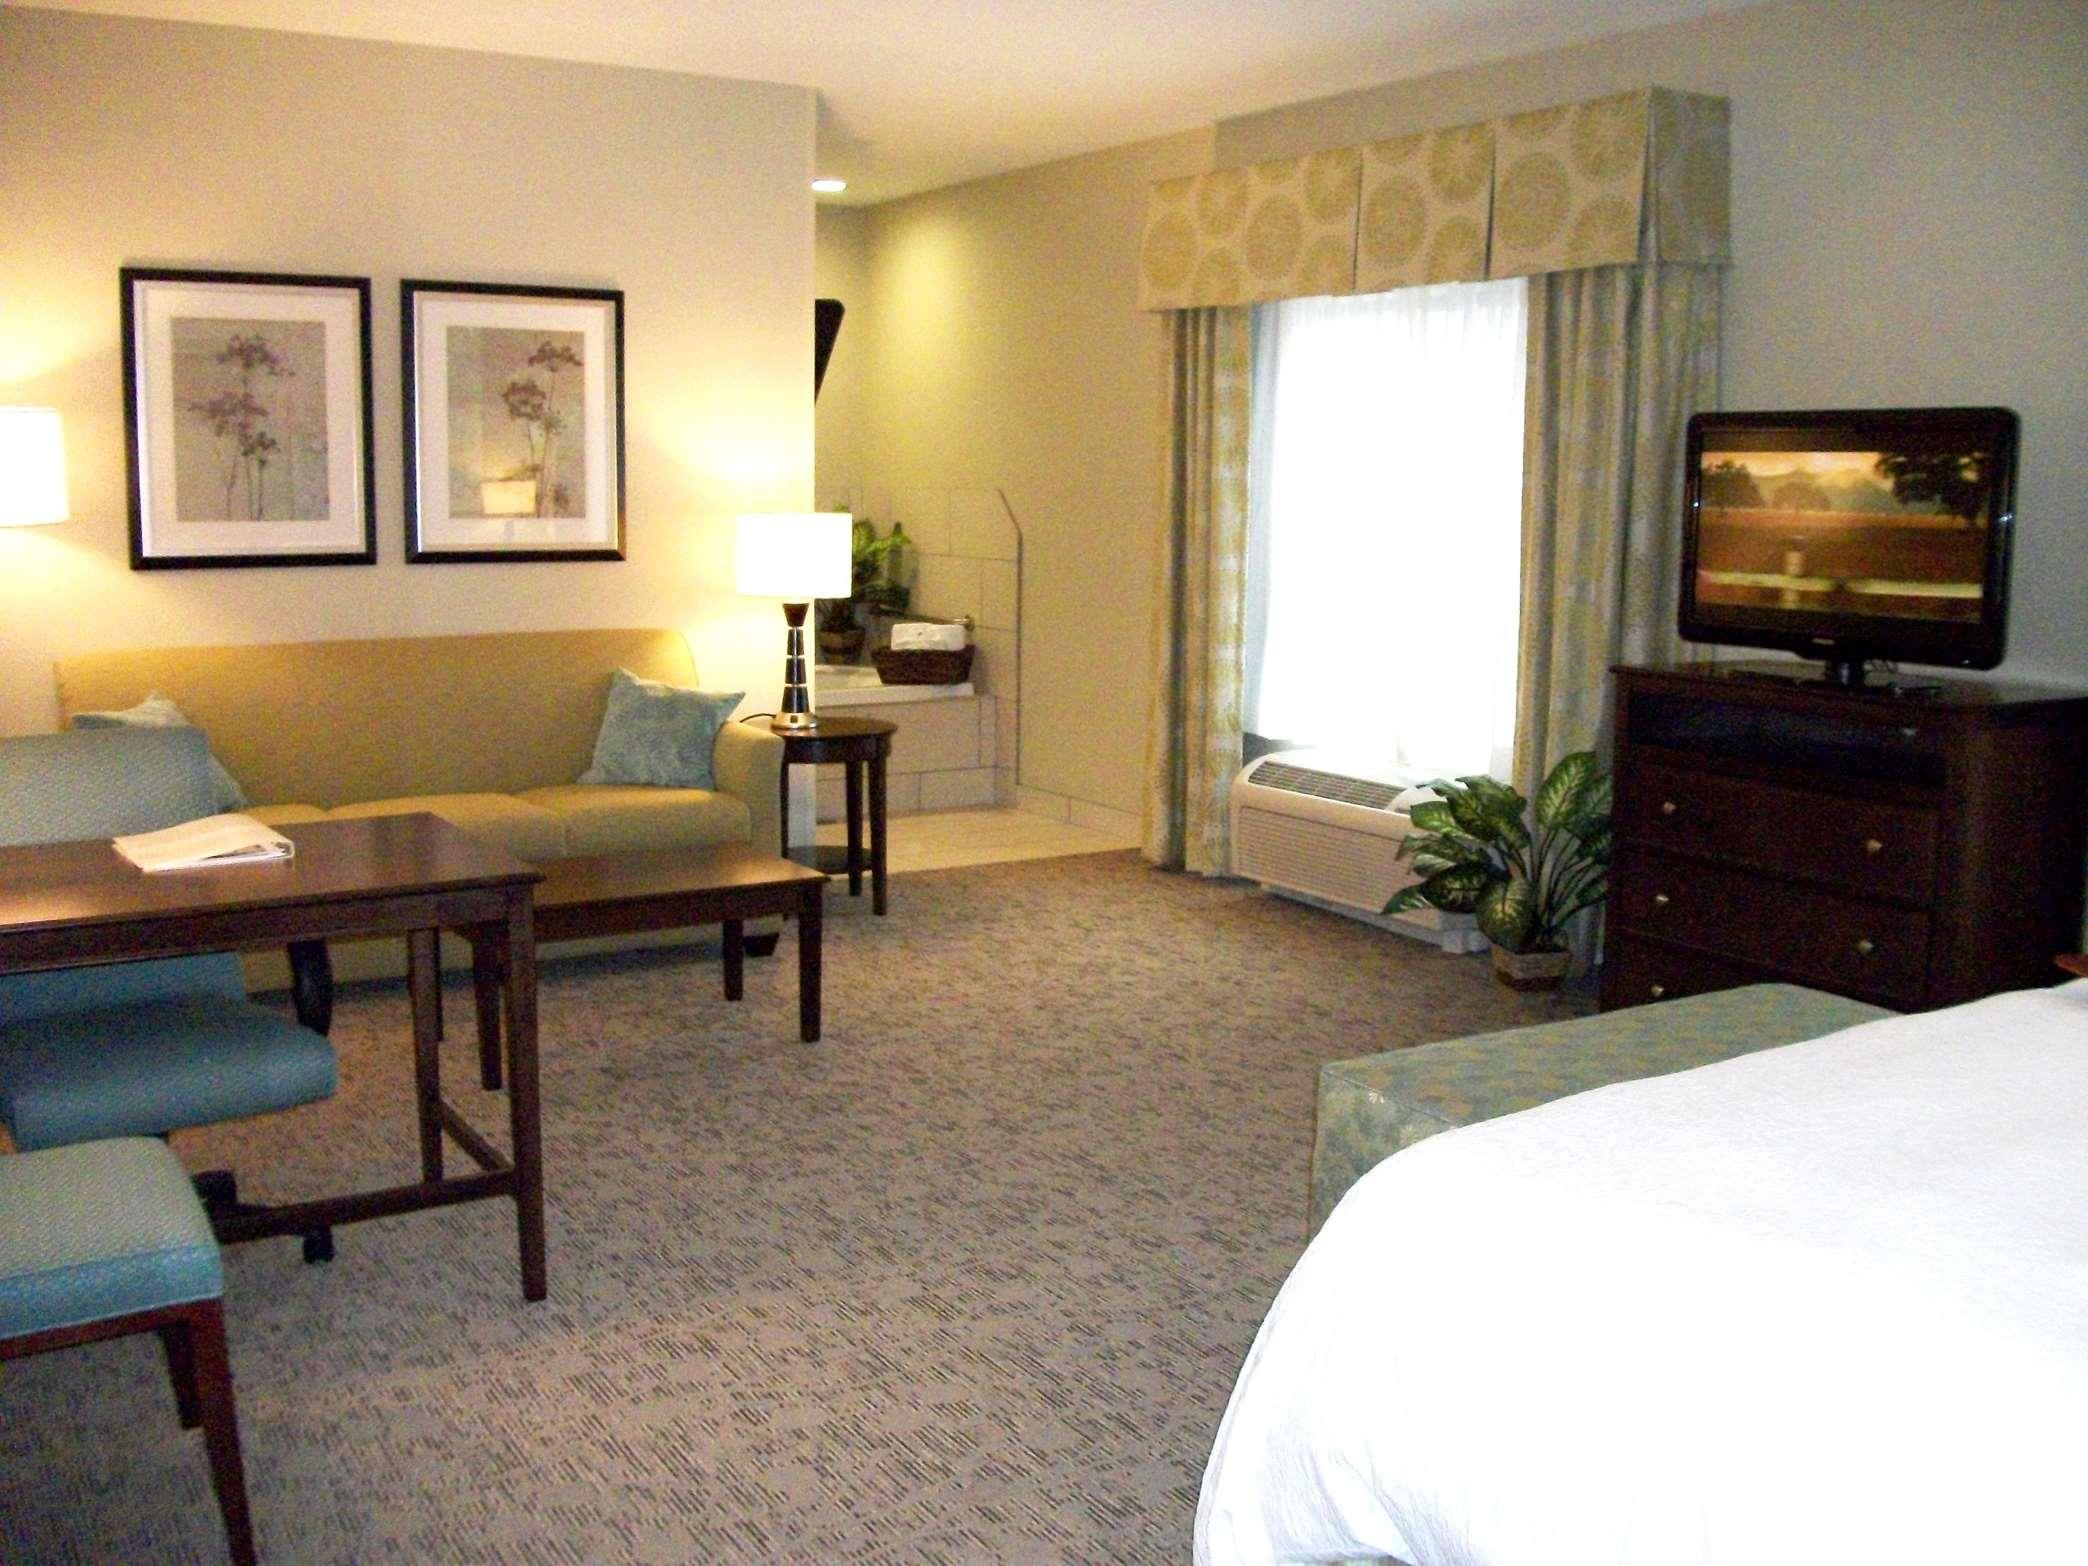 Hampton Inn & Suites Manteca image 20